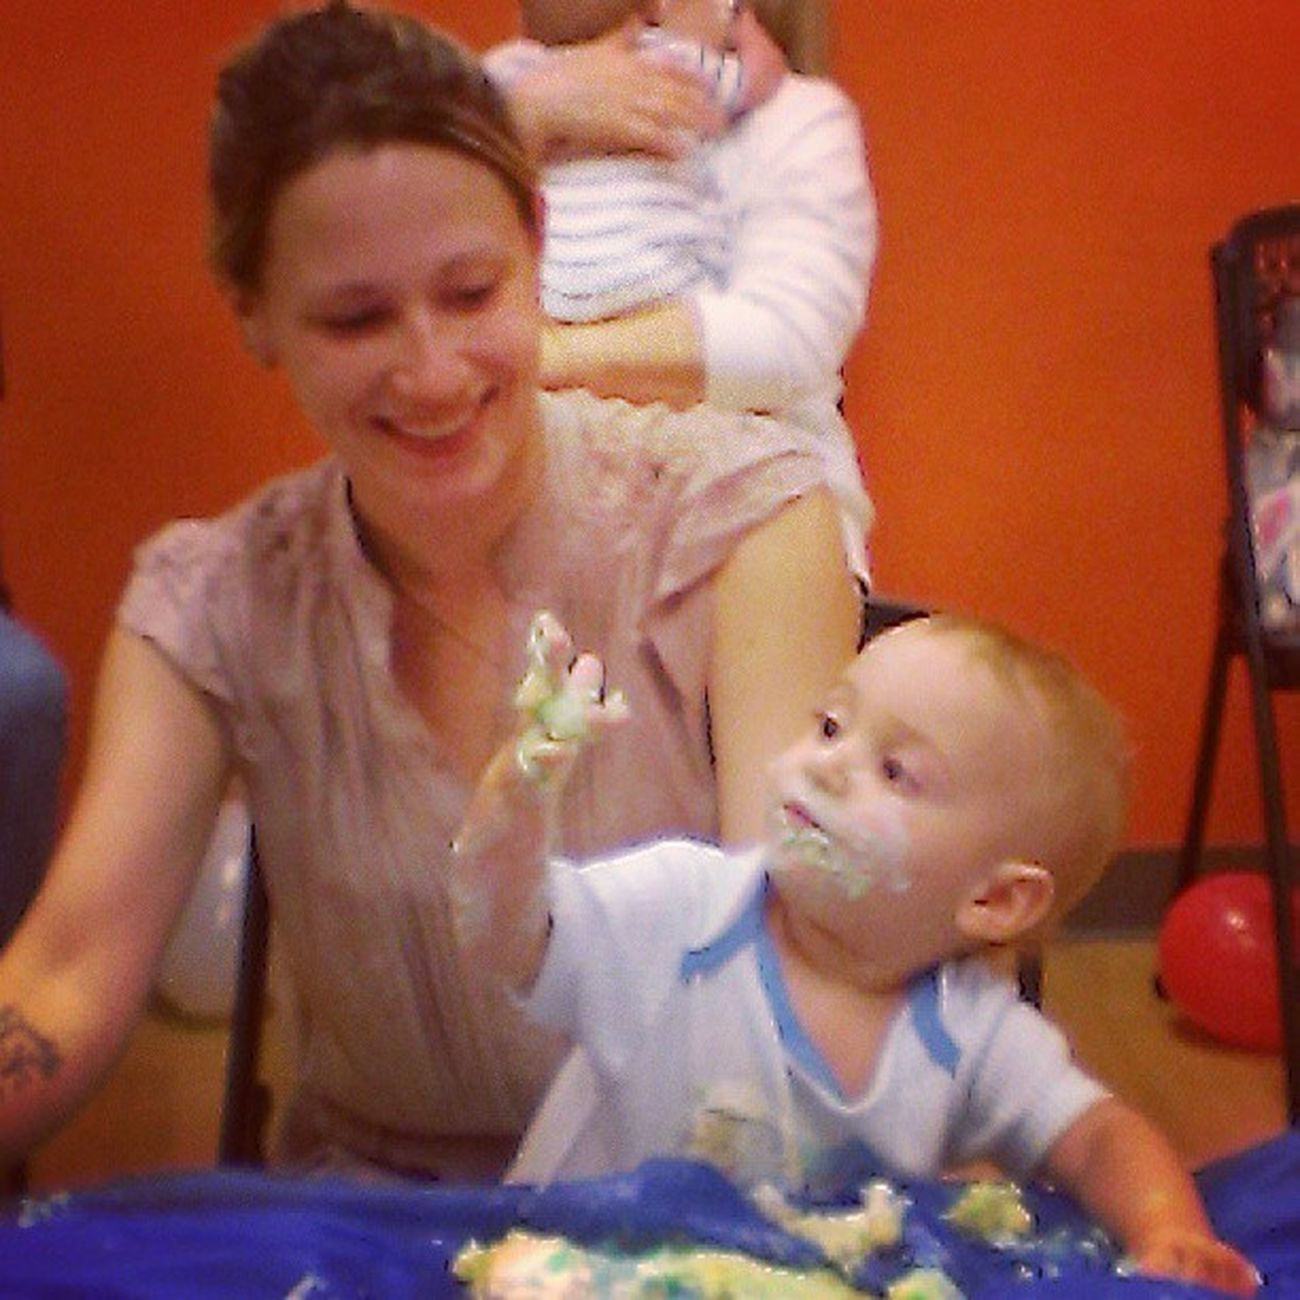 Yaayyy Cake Birthday Boy love @daniellefrank3